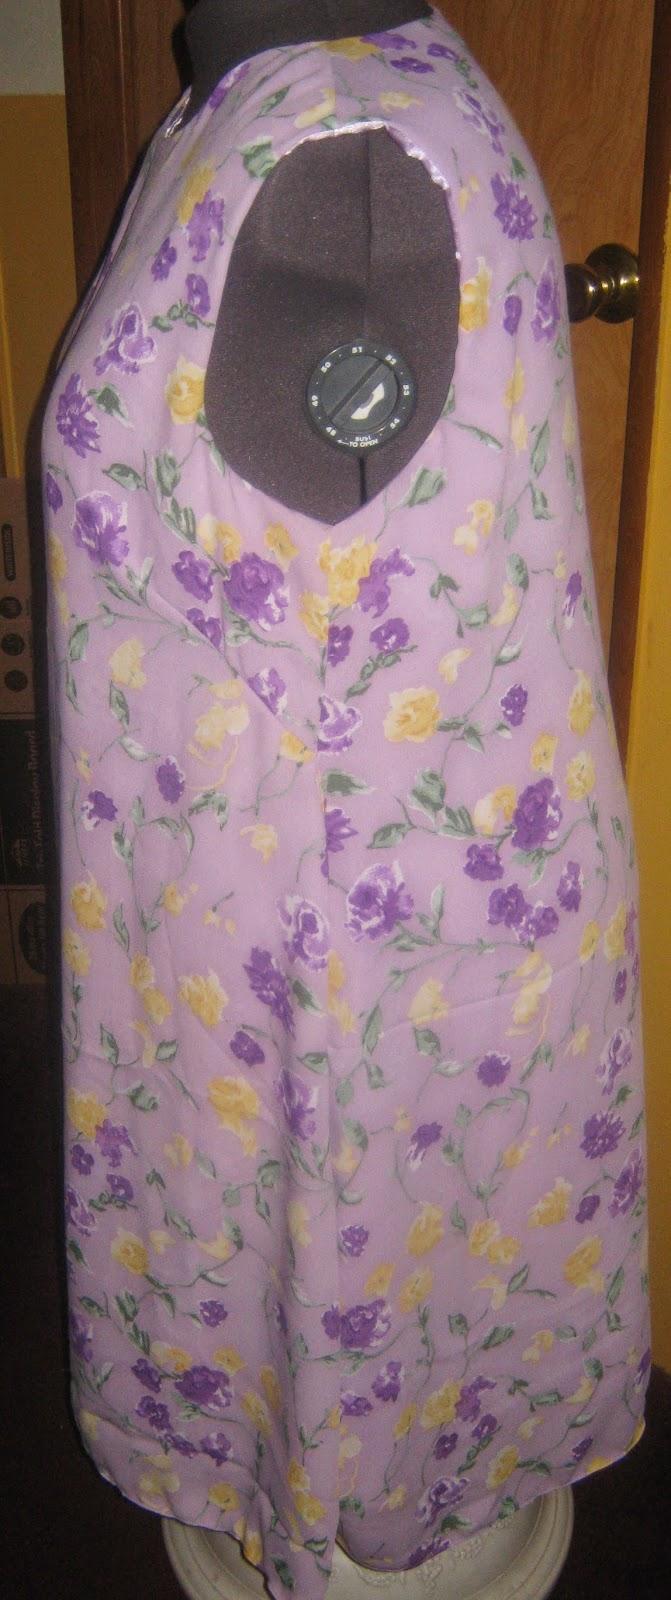 Simplicity 7117 sleeveless dress www.sewplus.blogspot.com side view